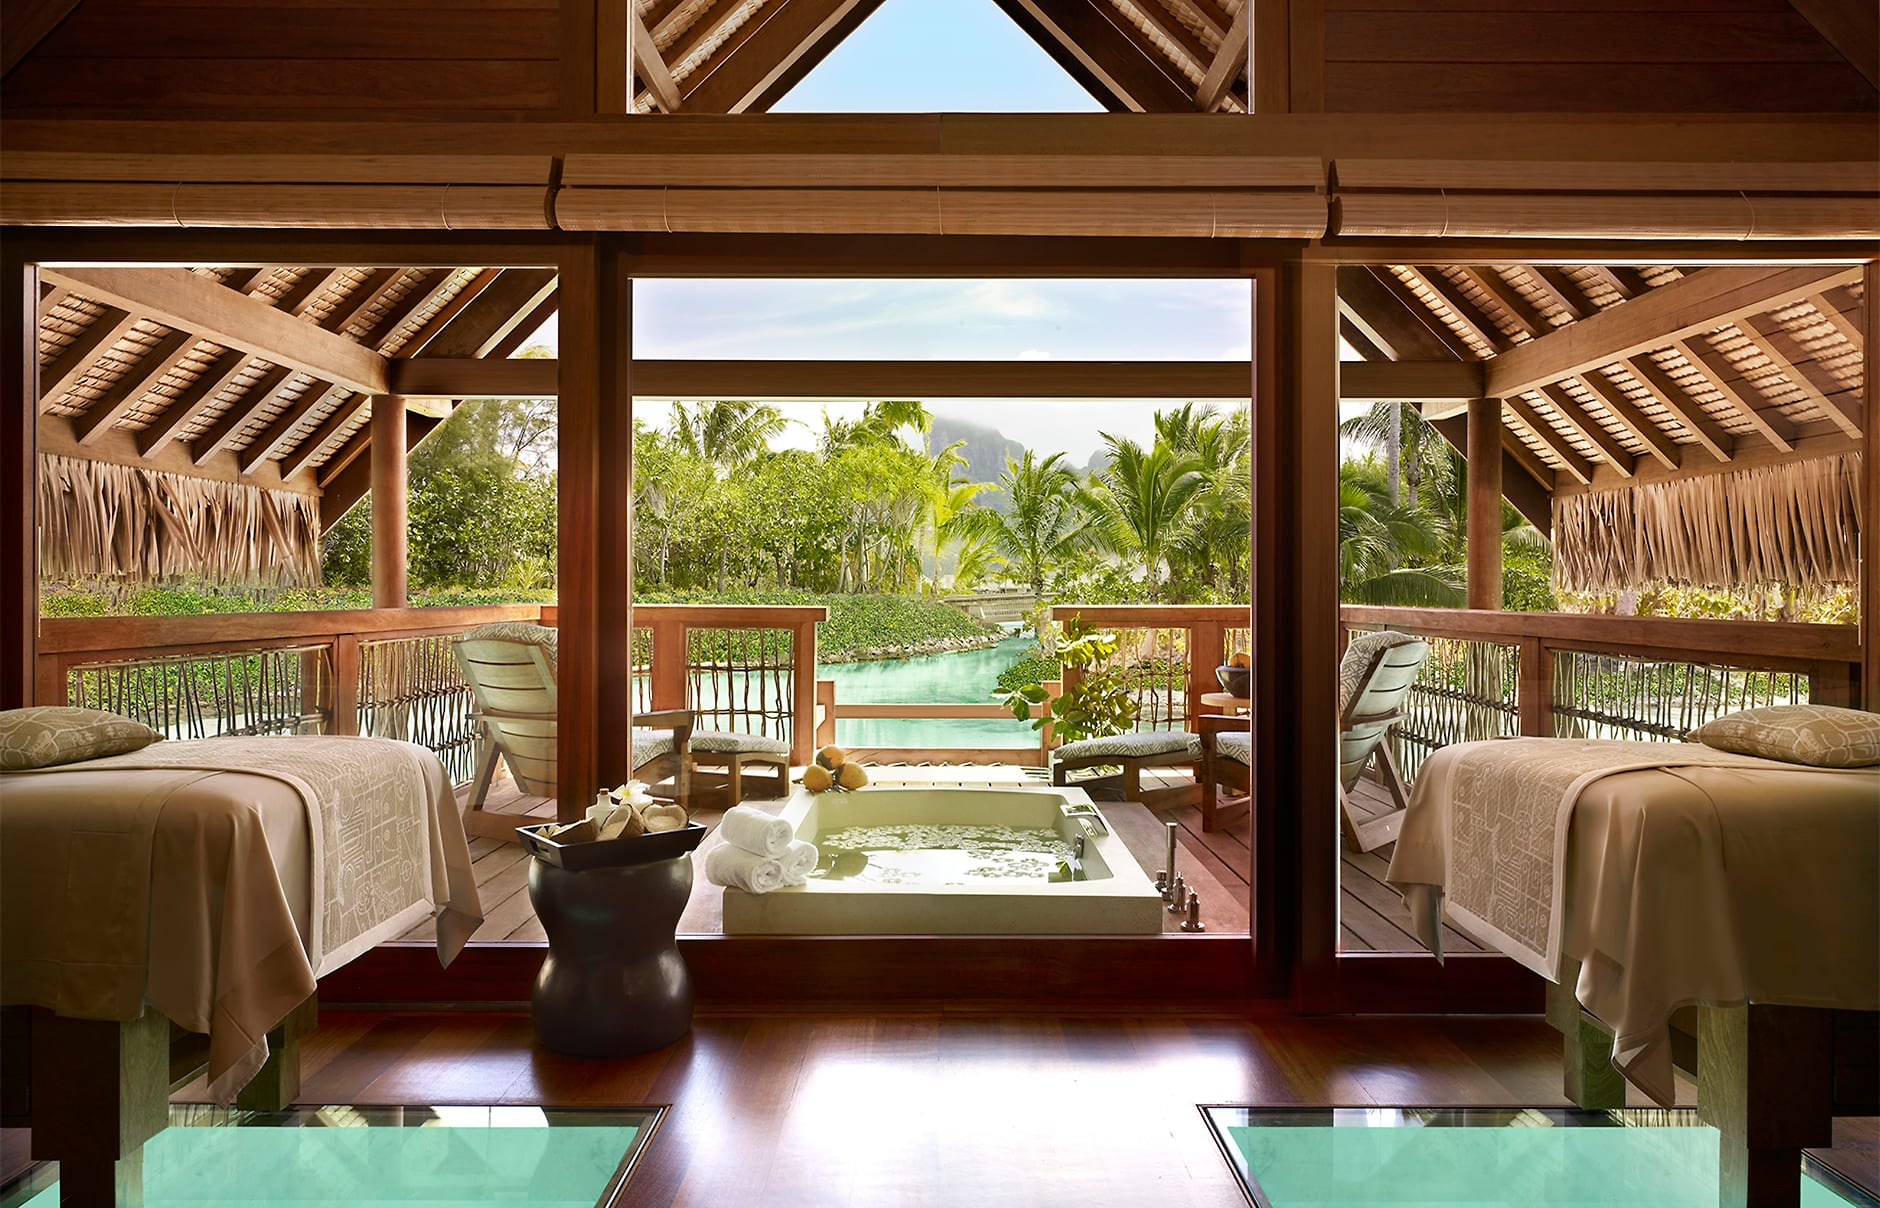 Four seasons resort bora bora luxury hotels travelplusstyle for Luxury hotel packages